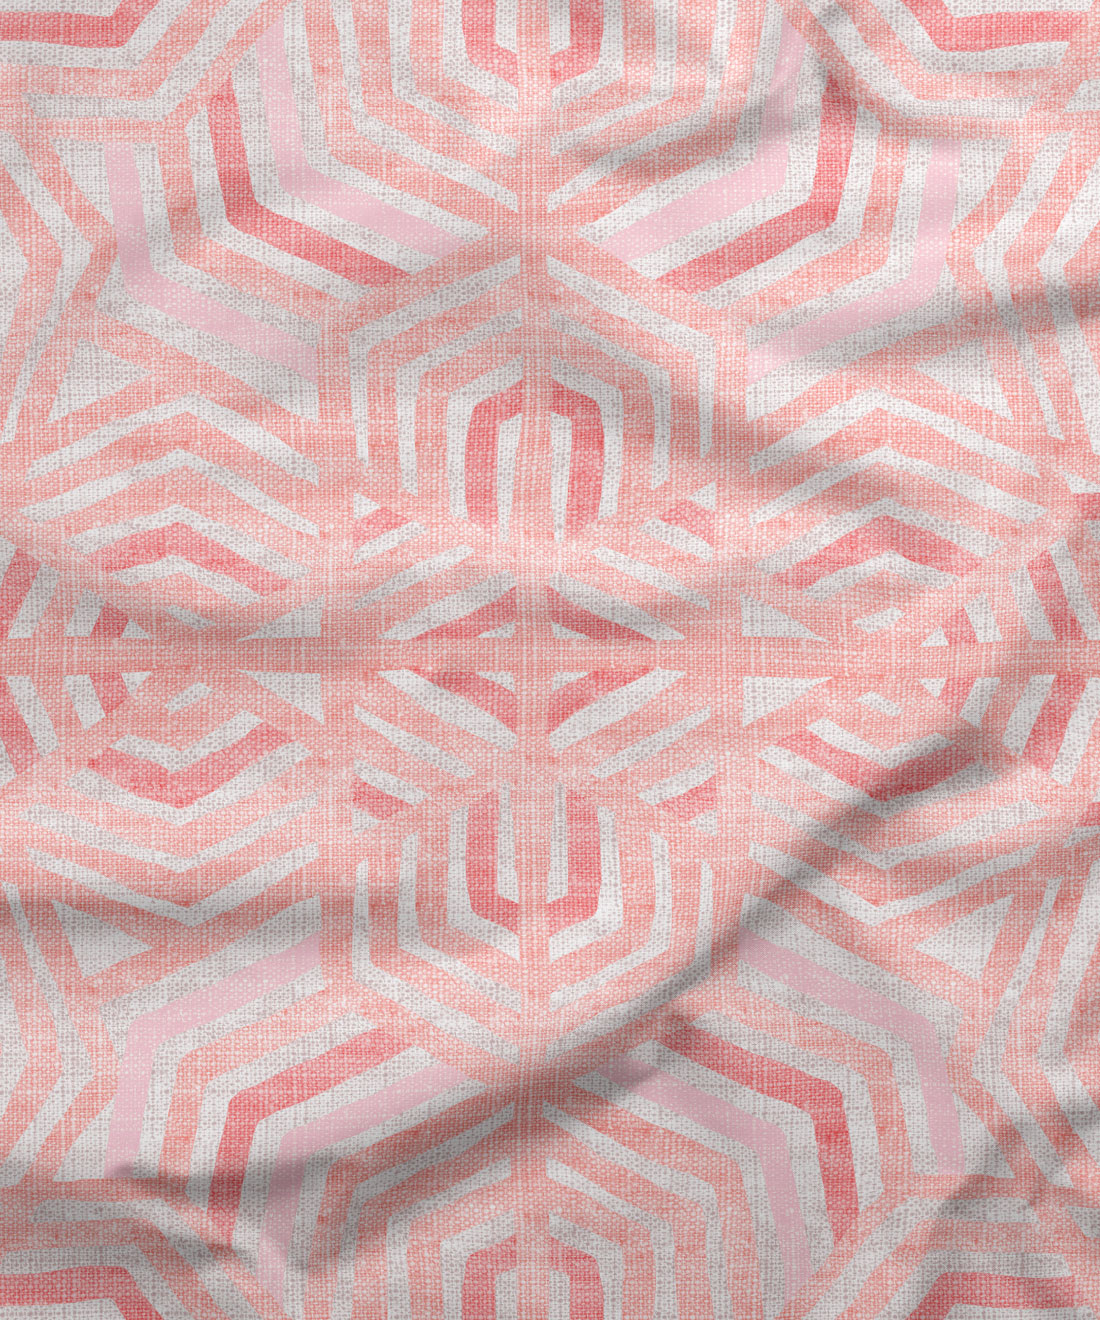 Bedouine Fabric